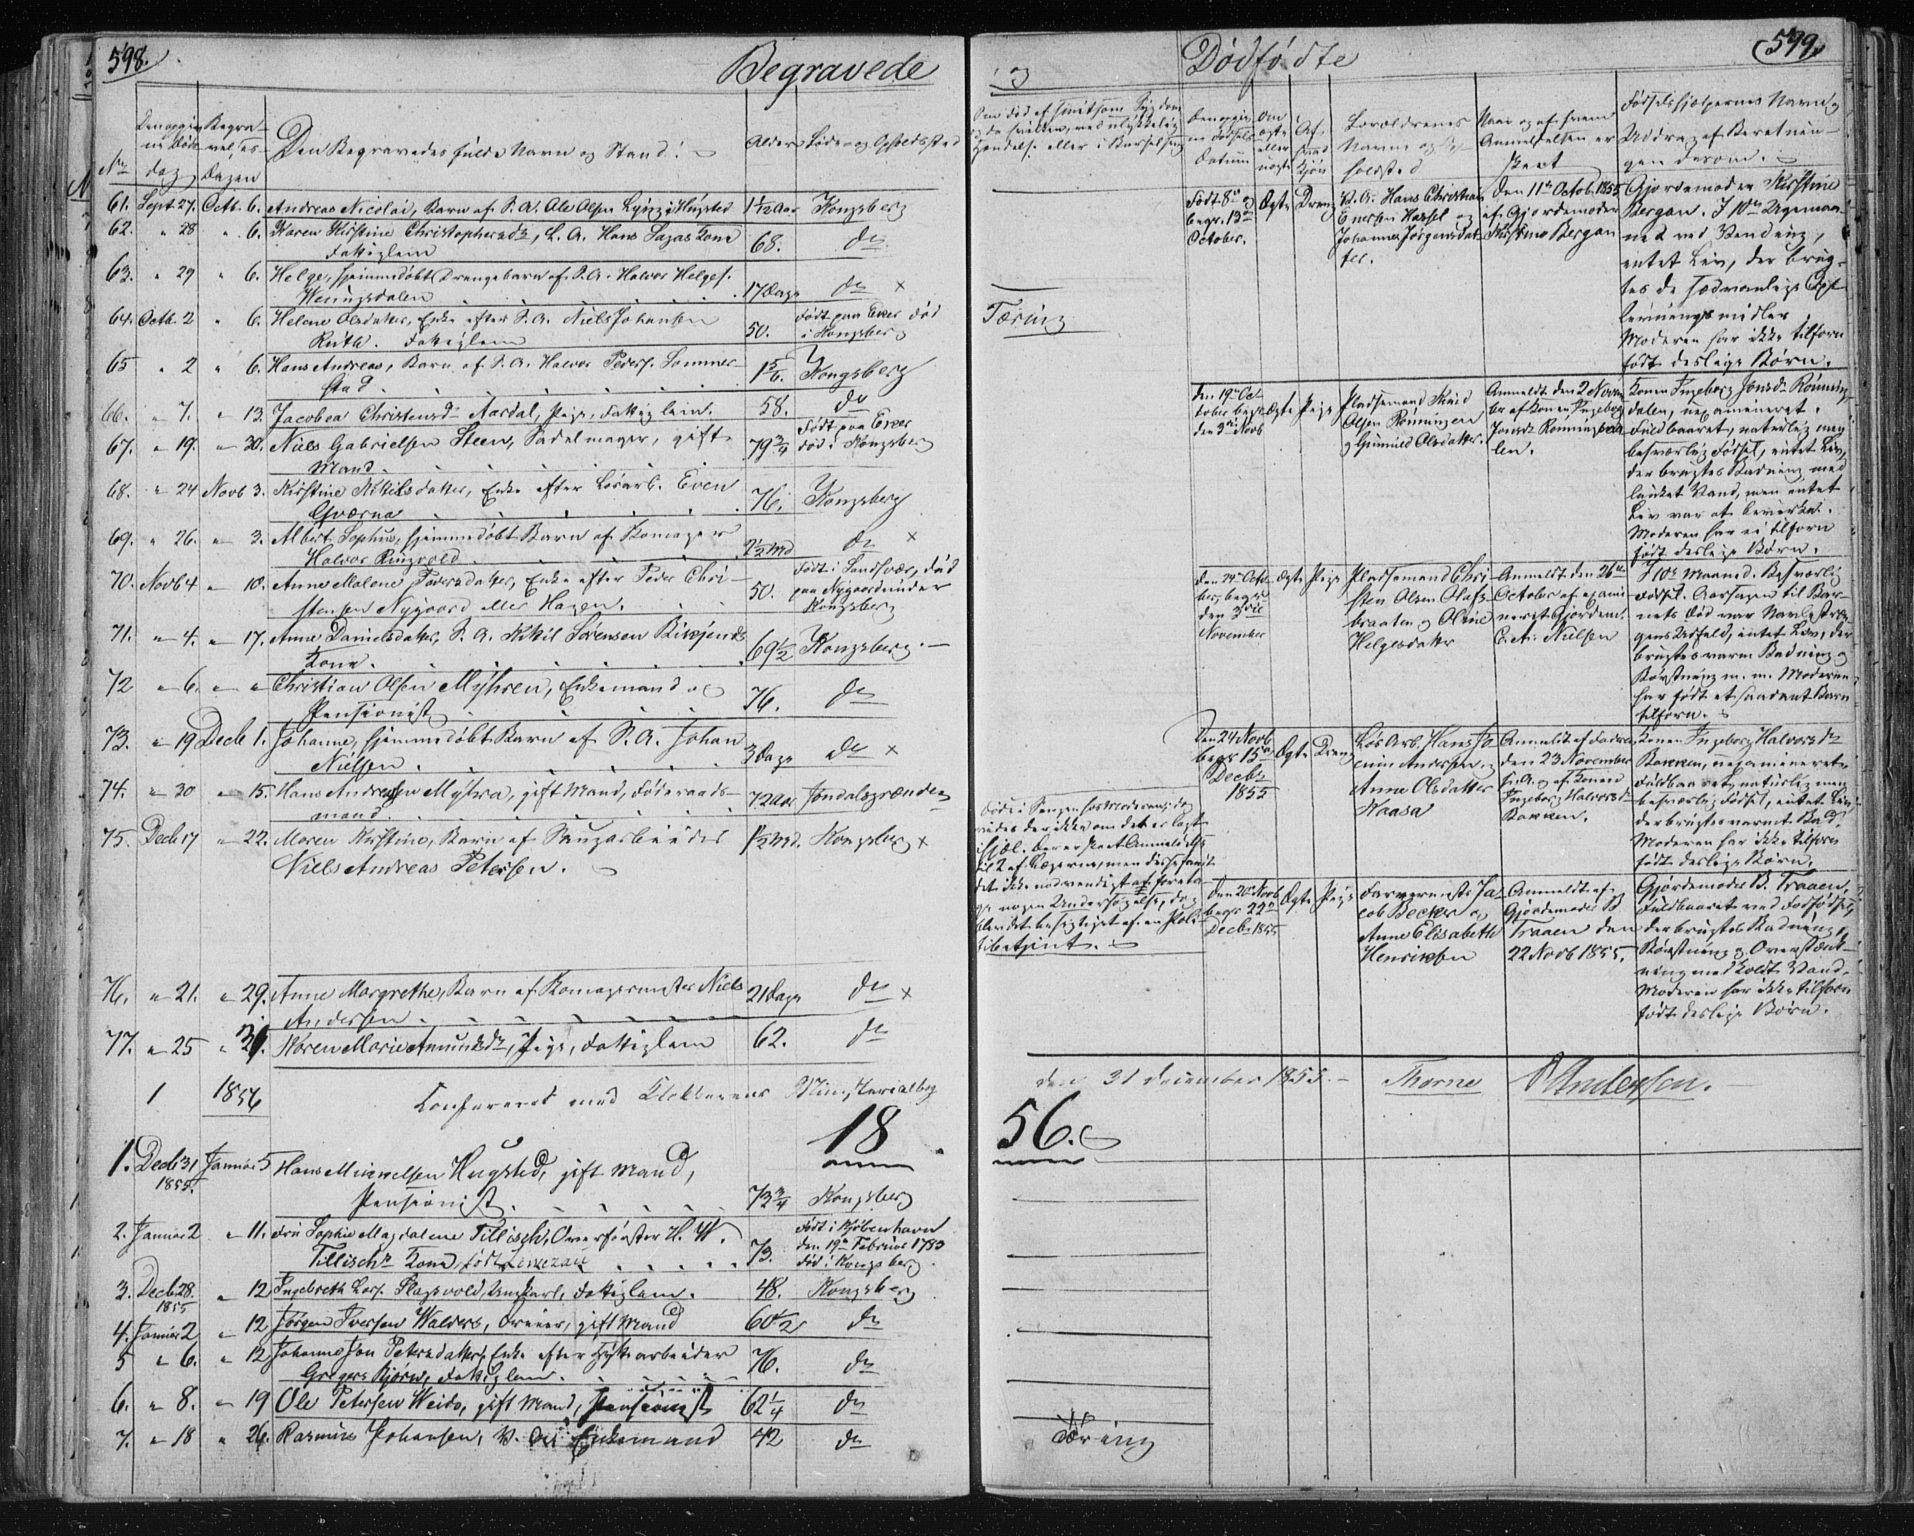 SAKO, Kongsberg kirkebøker, F/Fa/L0009: Parish register (official) no. I 9, 1839-1858, p. 598-599